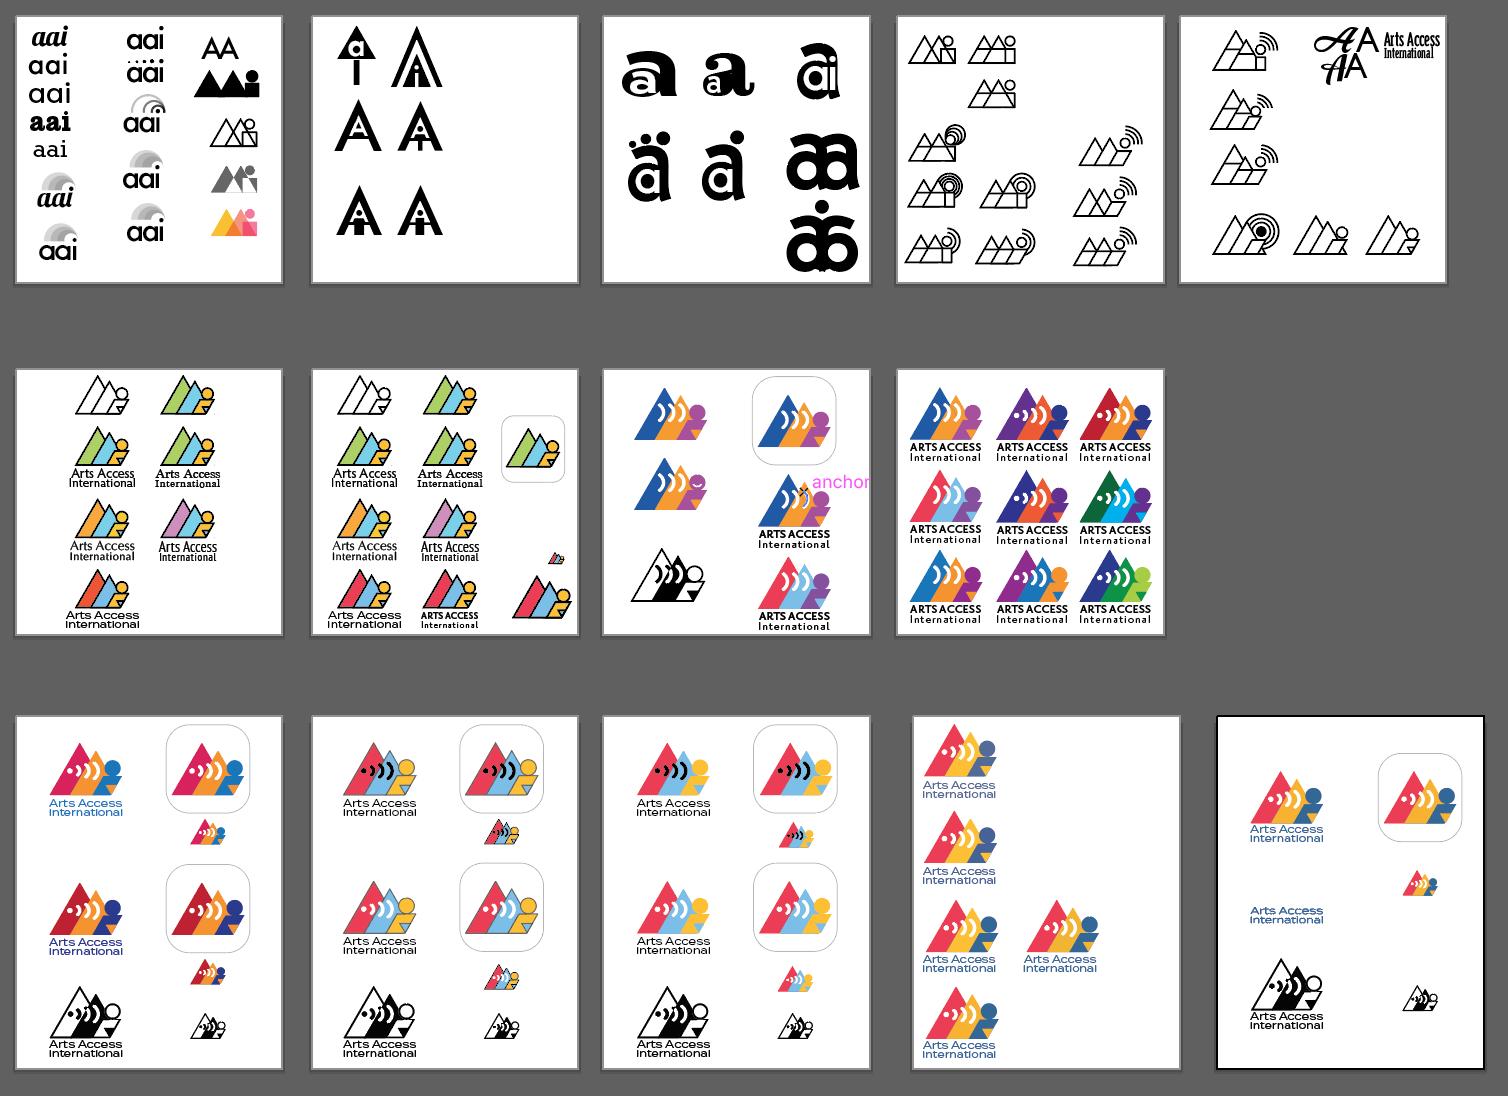 Arts Access International: Iterative process of logo creation.